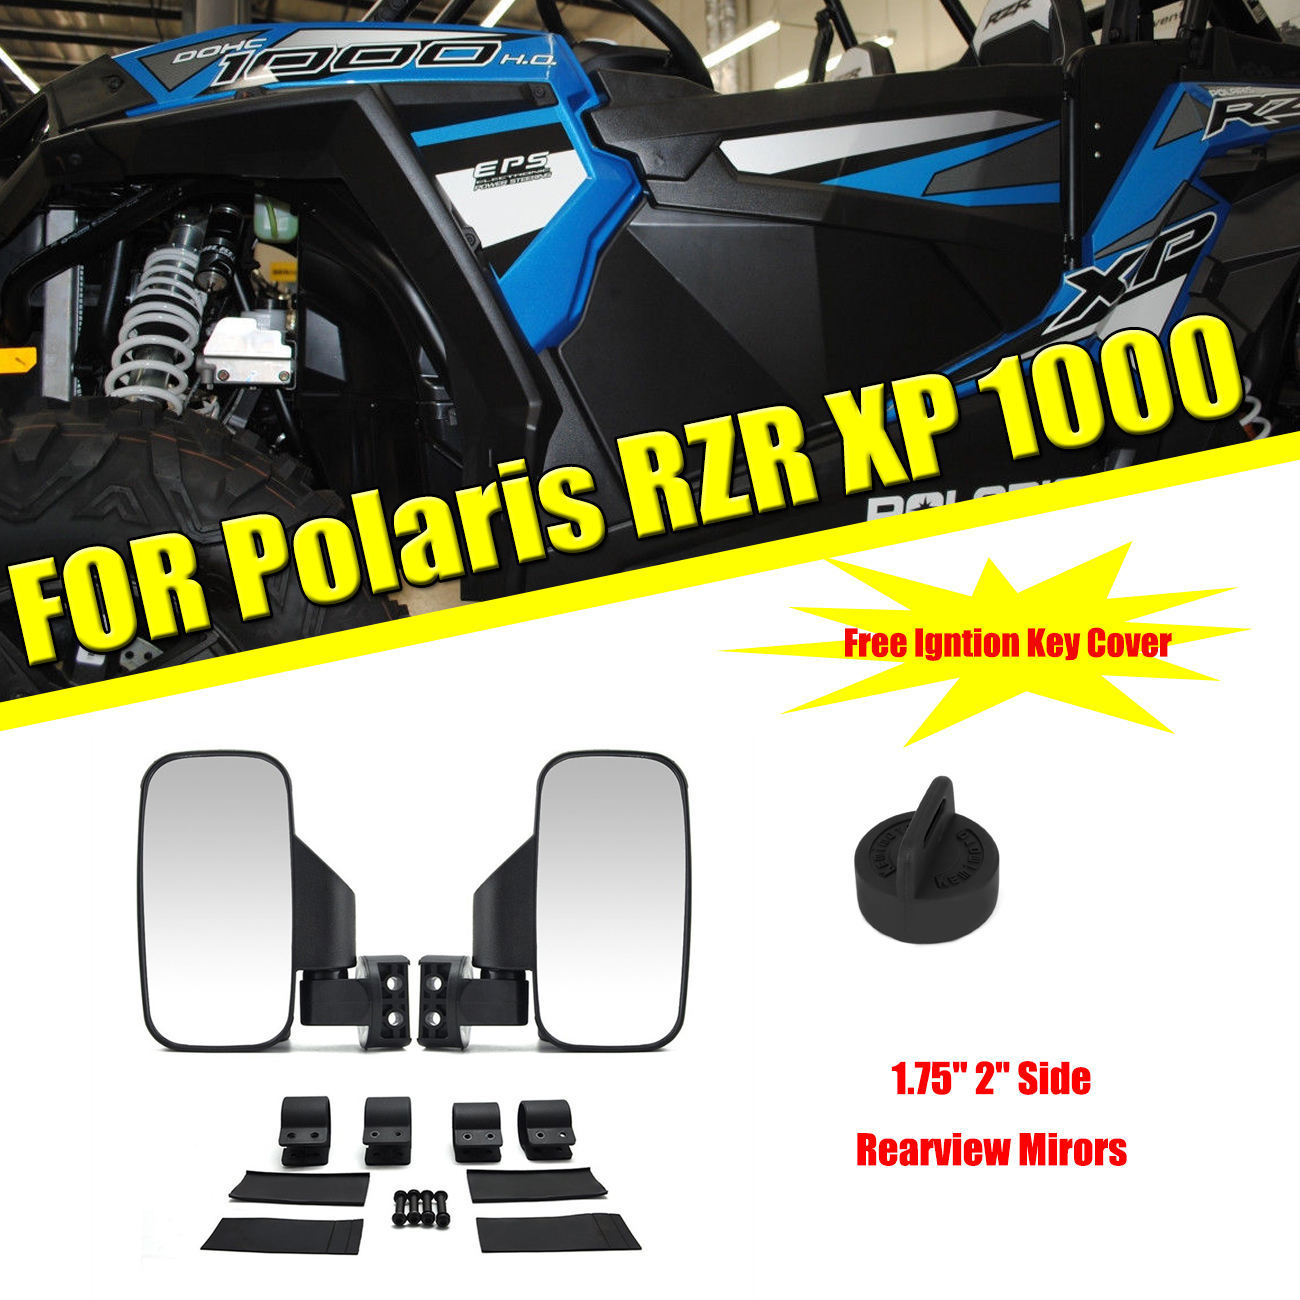 Kemimoto Mirror Can Am UTV Polaris Ranger RZR 1000 for 2-Side-Rearview-Mirrors 800 900